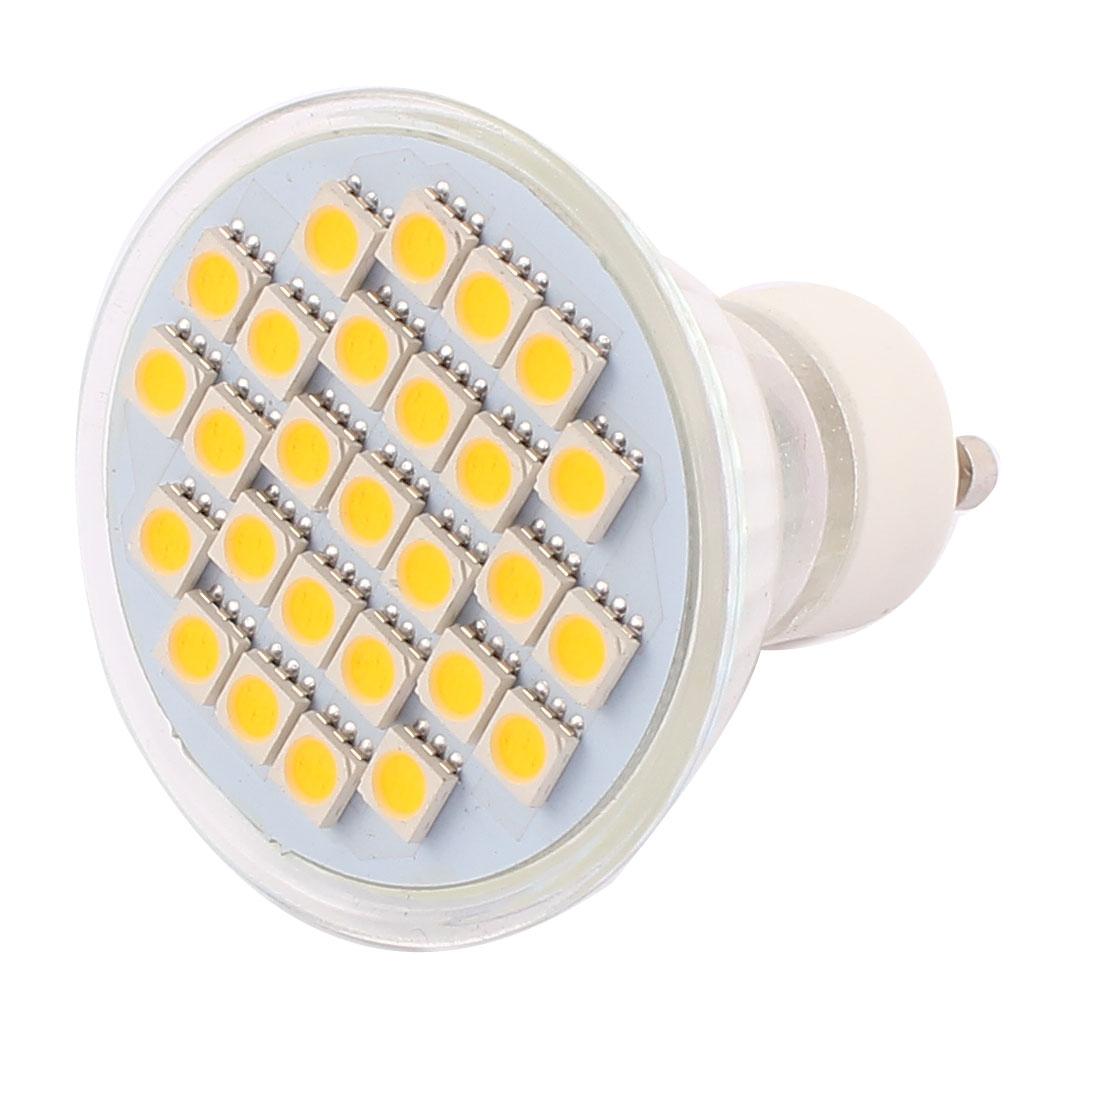 GU10 SMD5050 27LEDs AC 220V 4W Glass Energy Saving LED Lamp Bulb Warm White